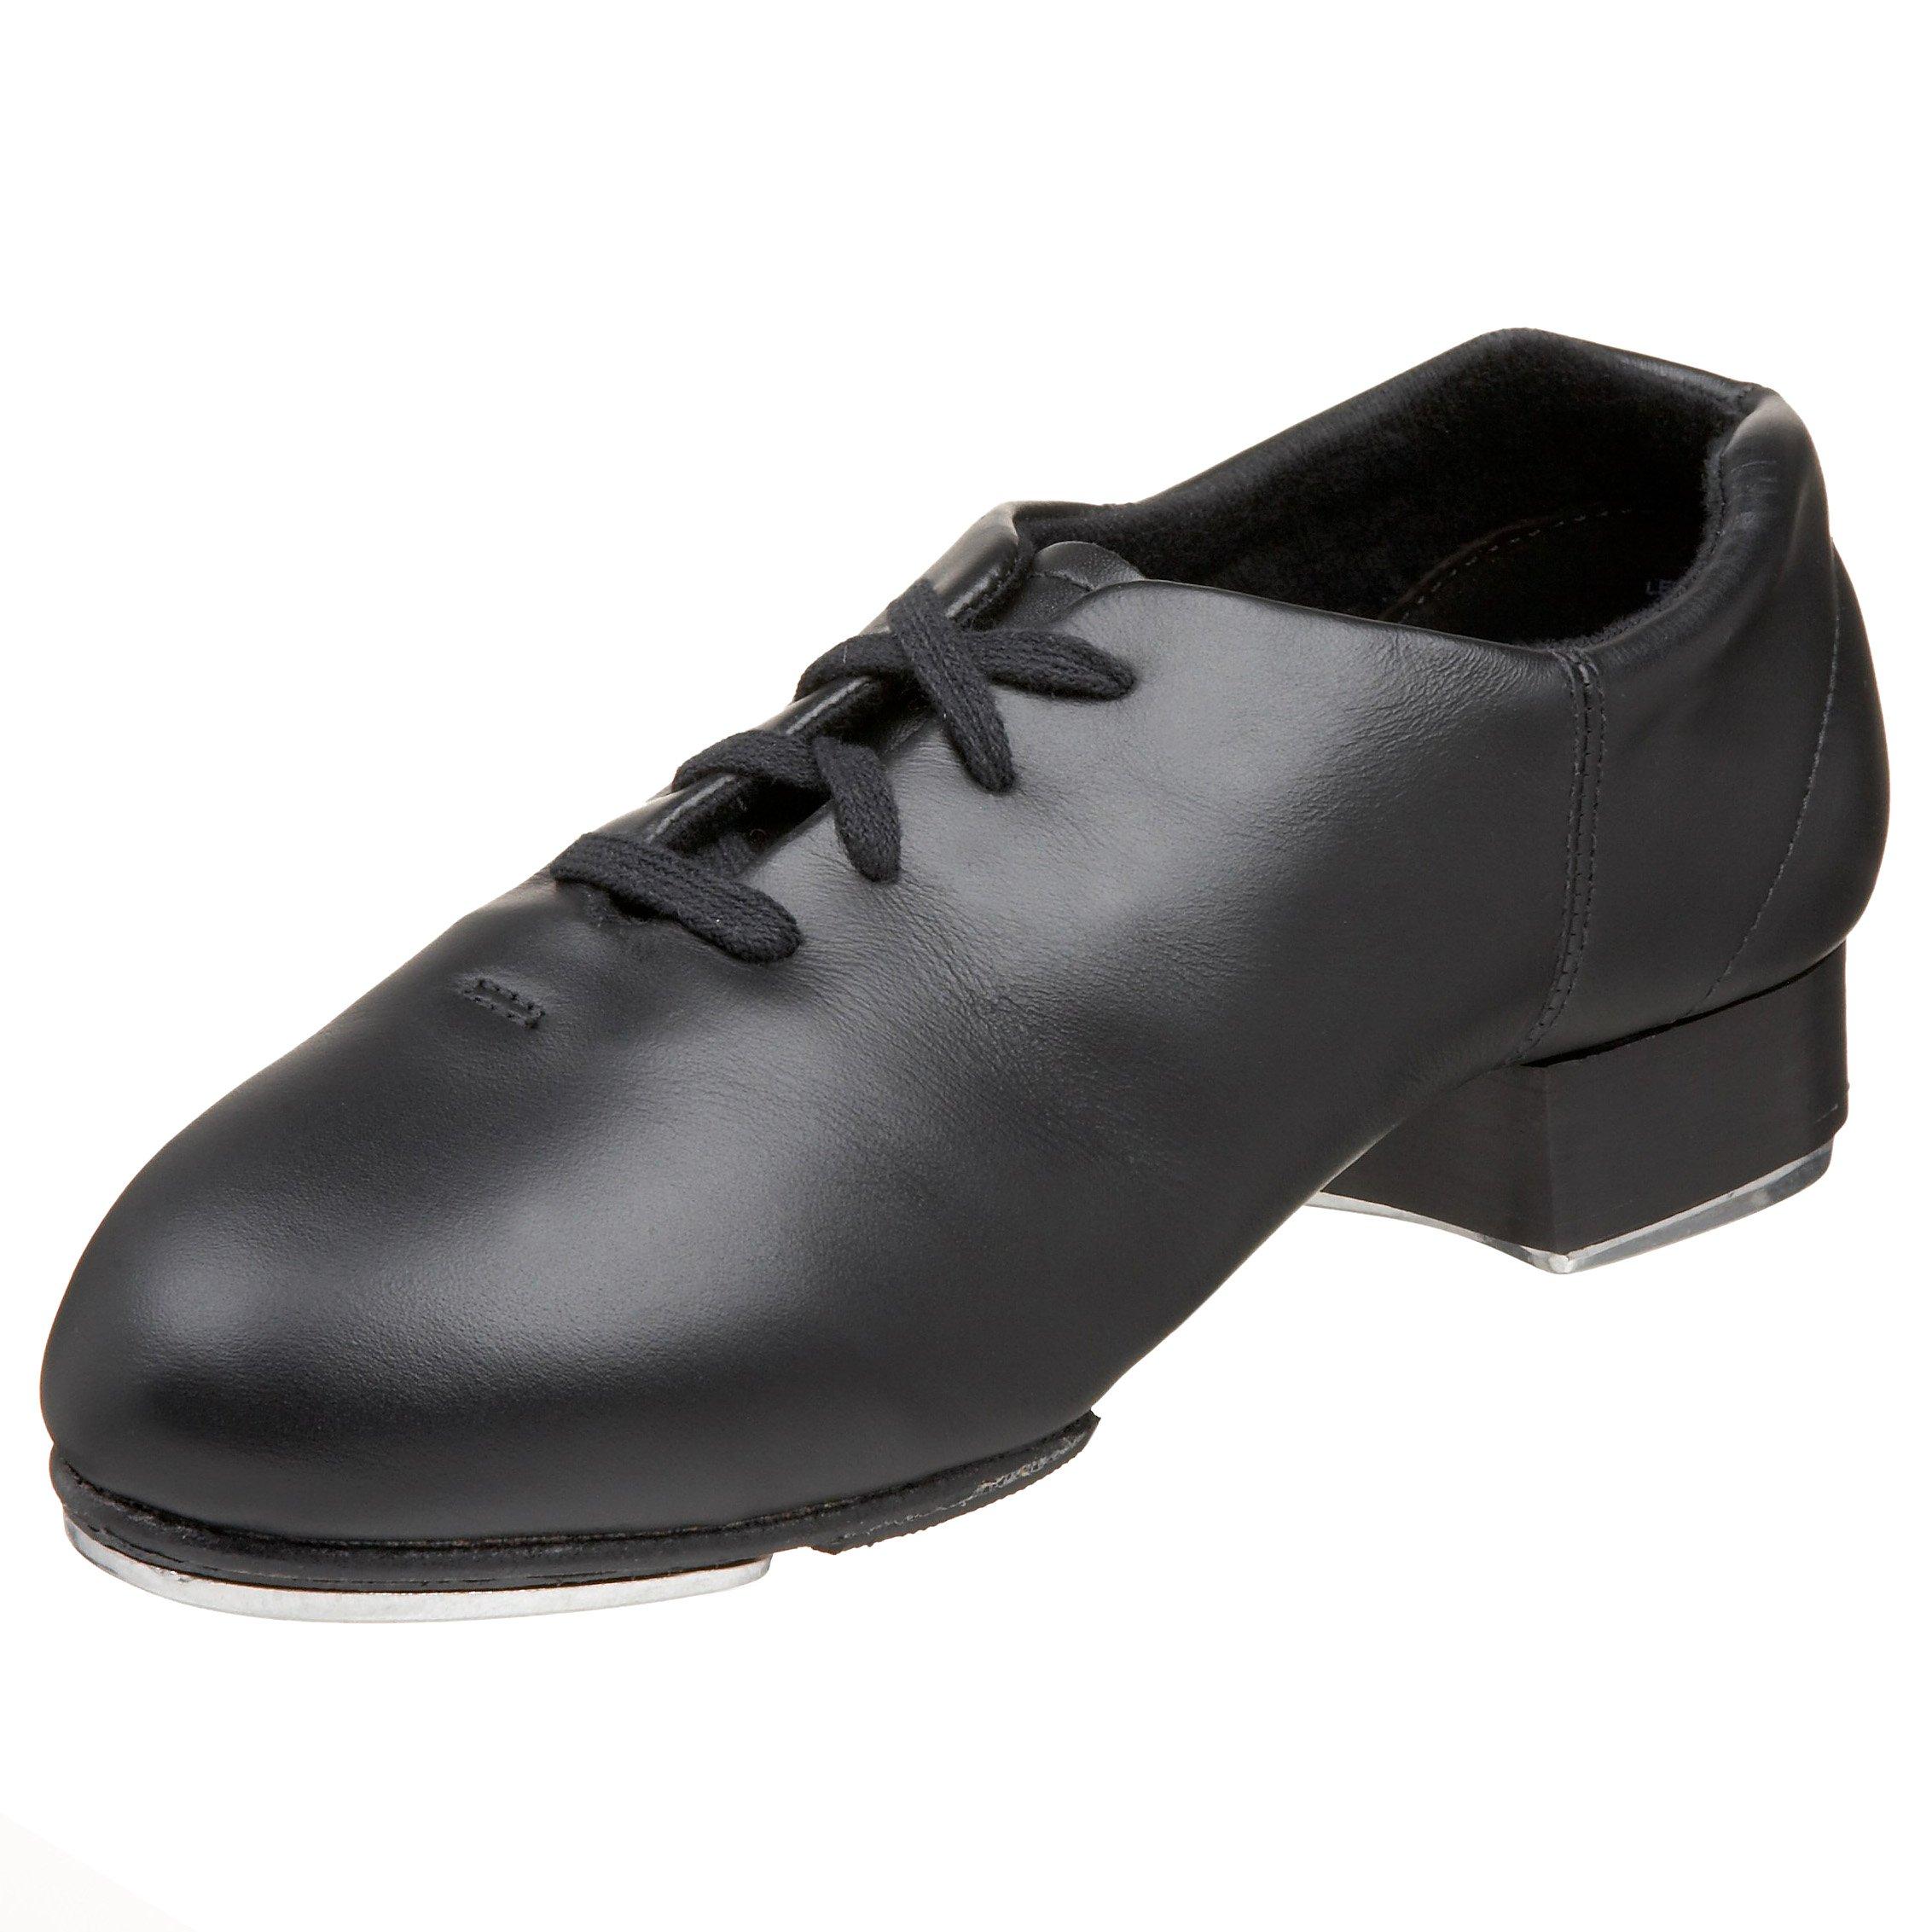 Capezio Women's Flex Master Tap Shoe,Black,9.5 W US by Capezio